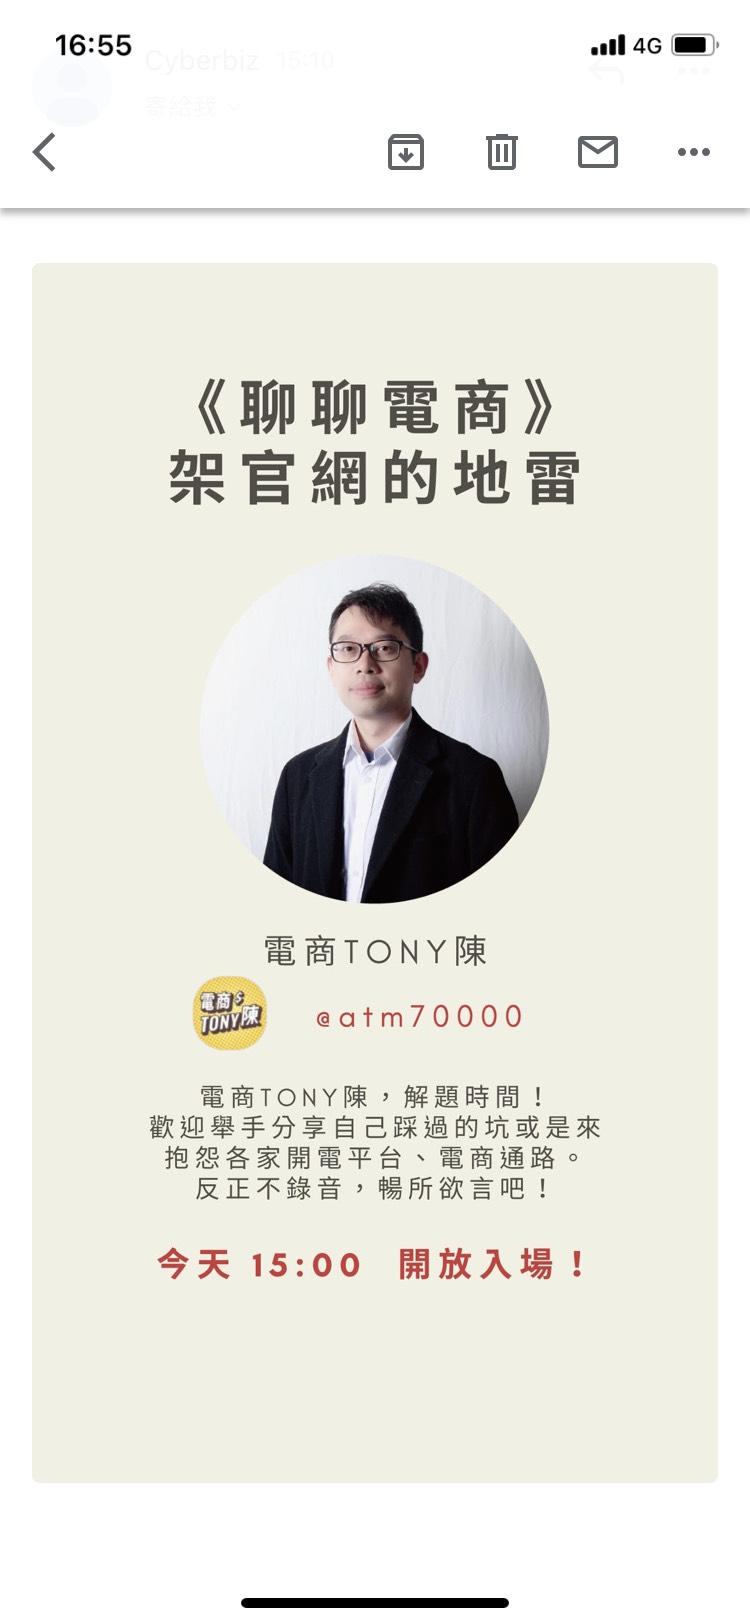 電商Tony陳Clubhouse